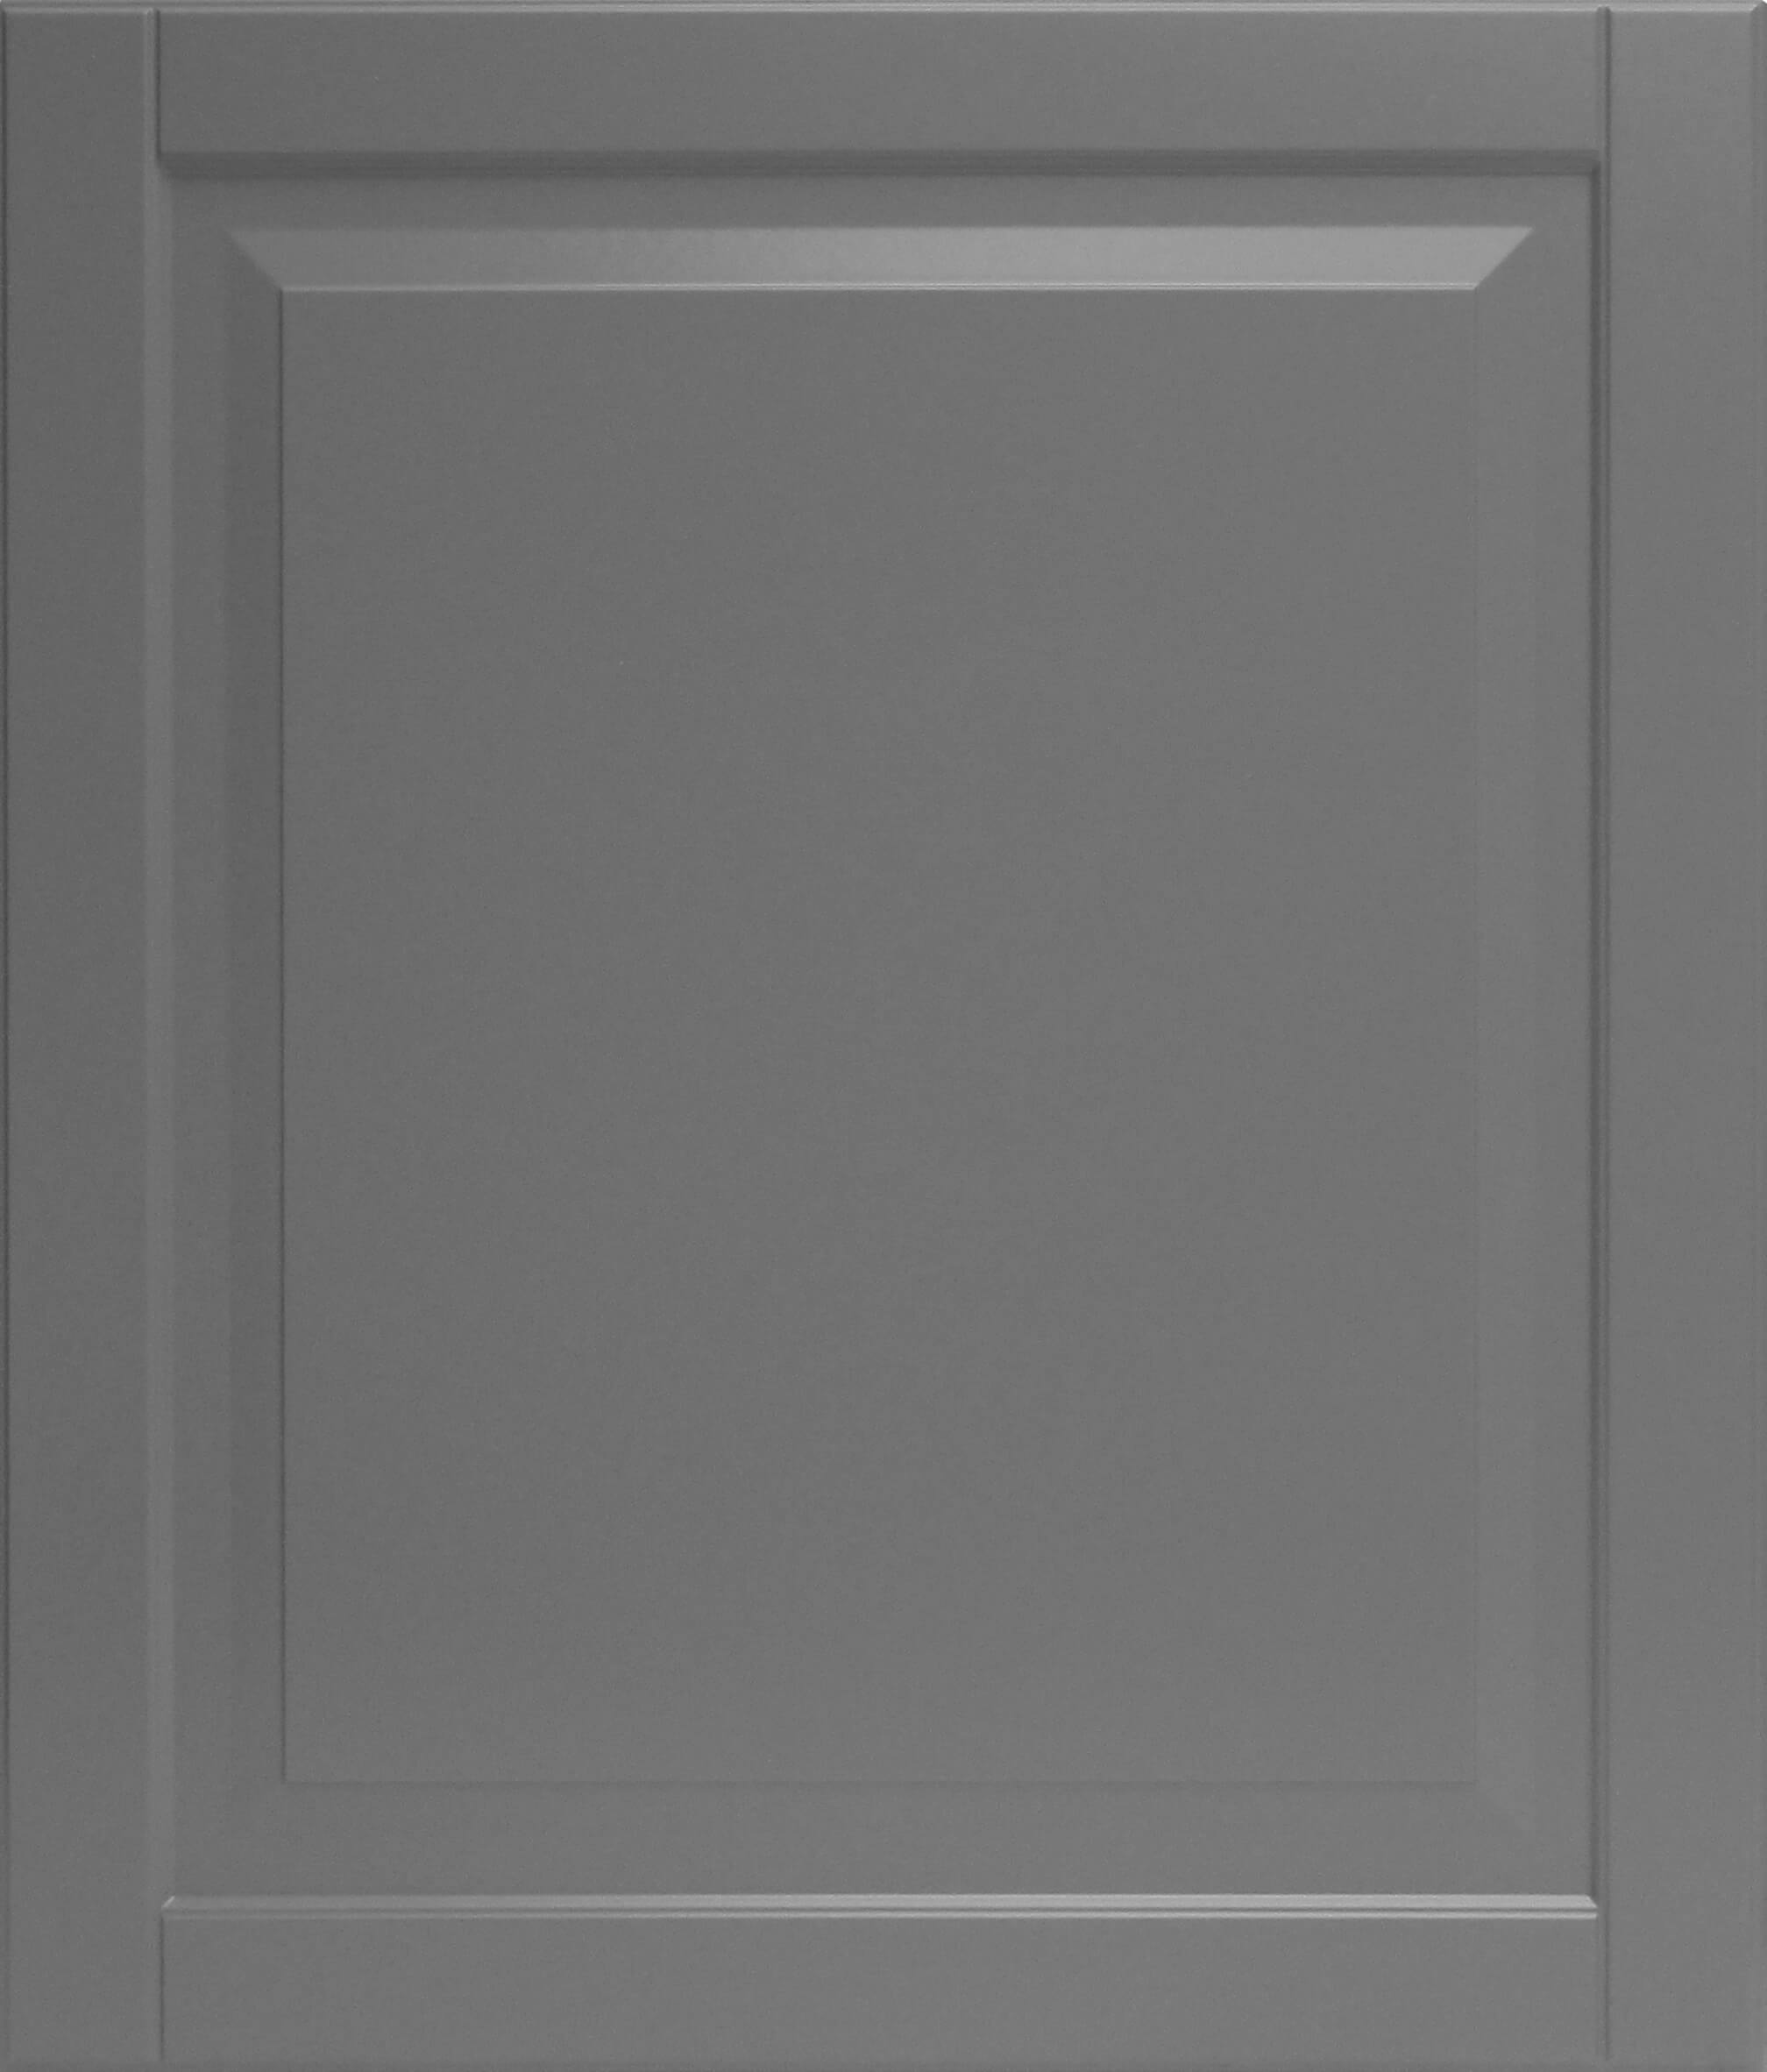 ikea lidingÖ geschirrspüler front 60x70cm grau 202.206.66-20220666